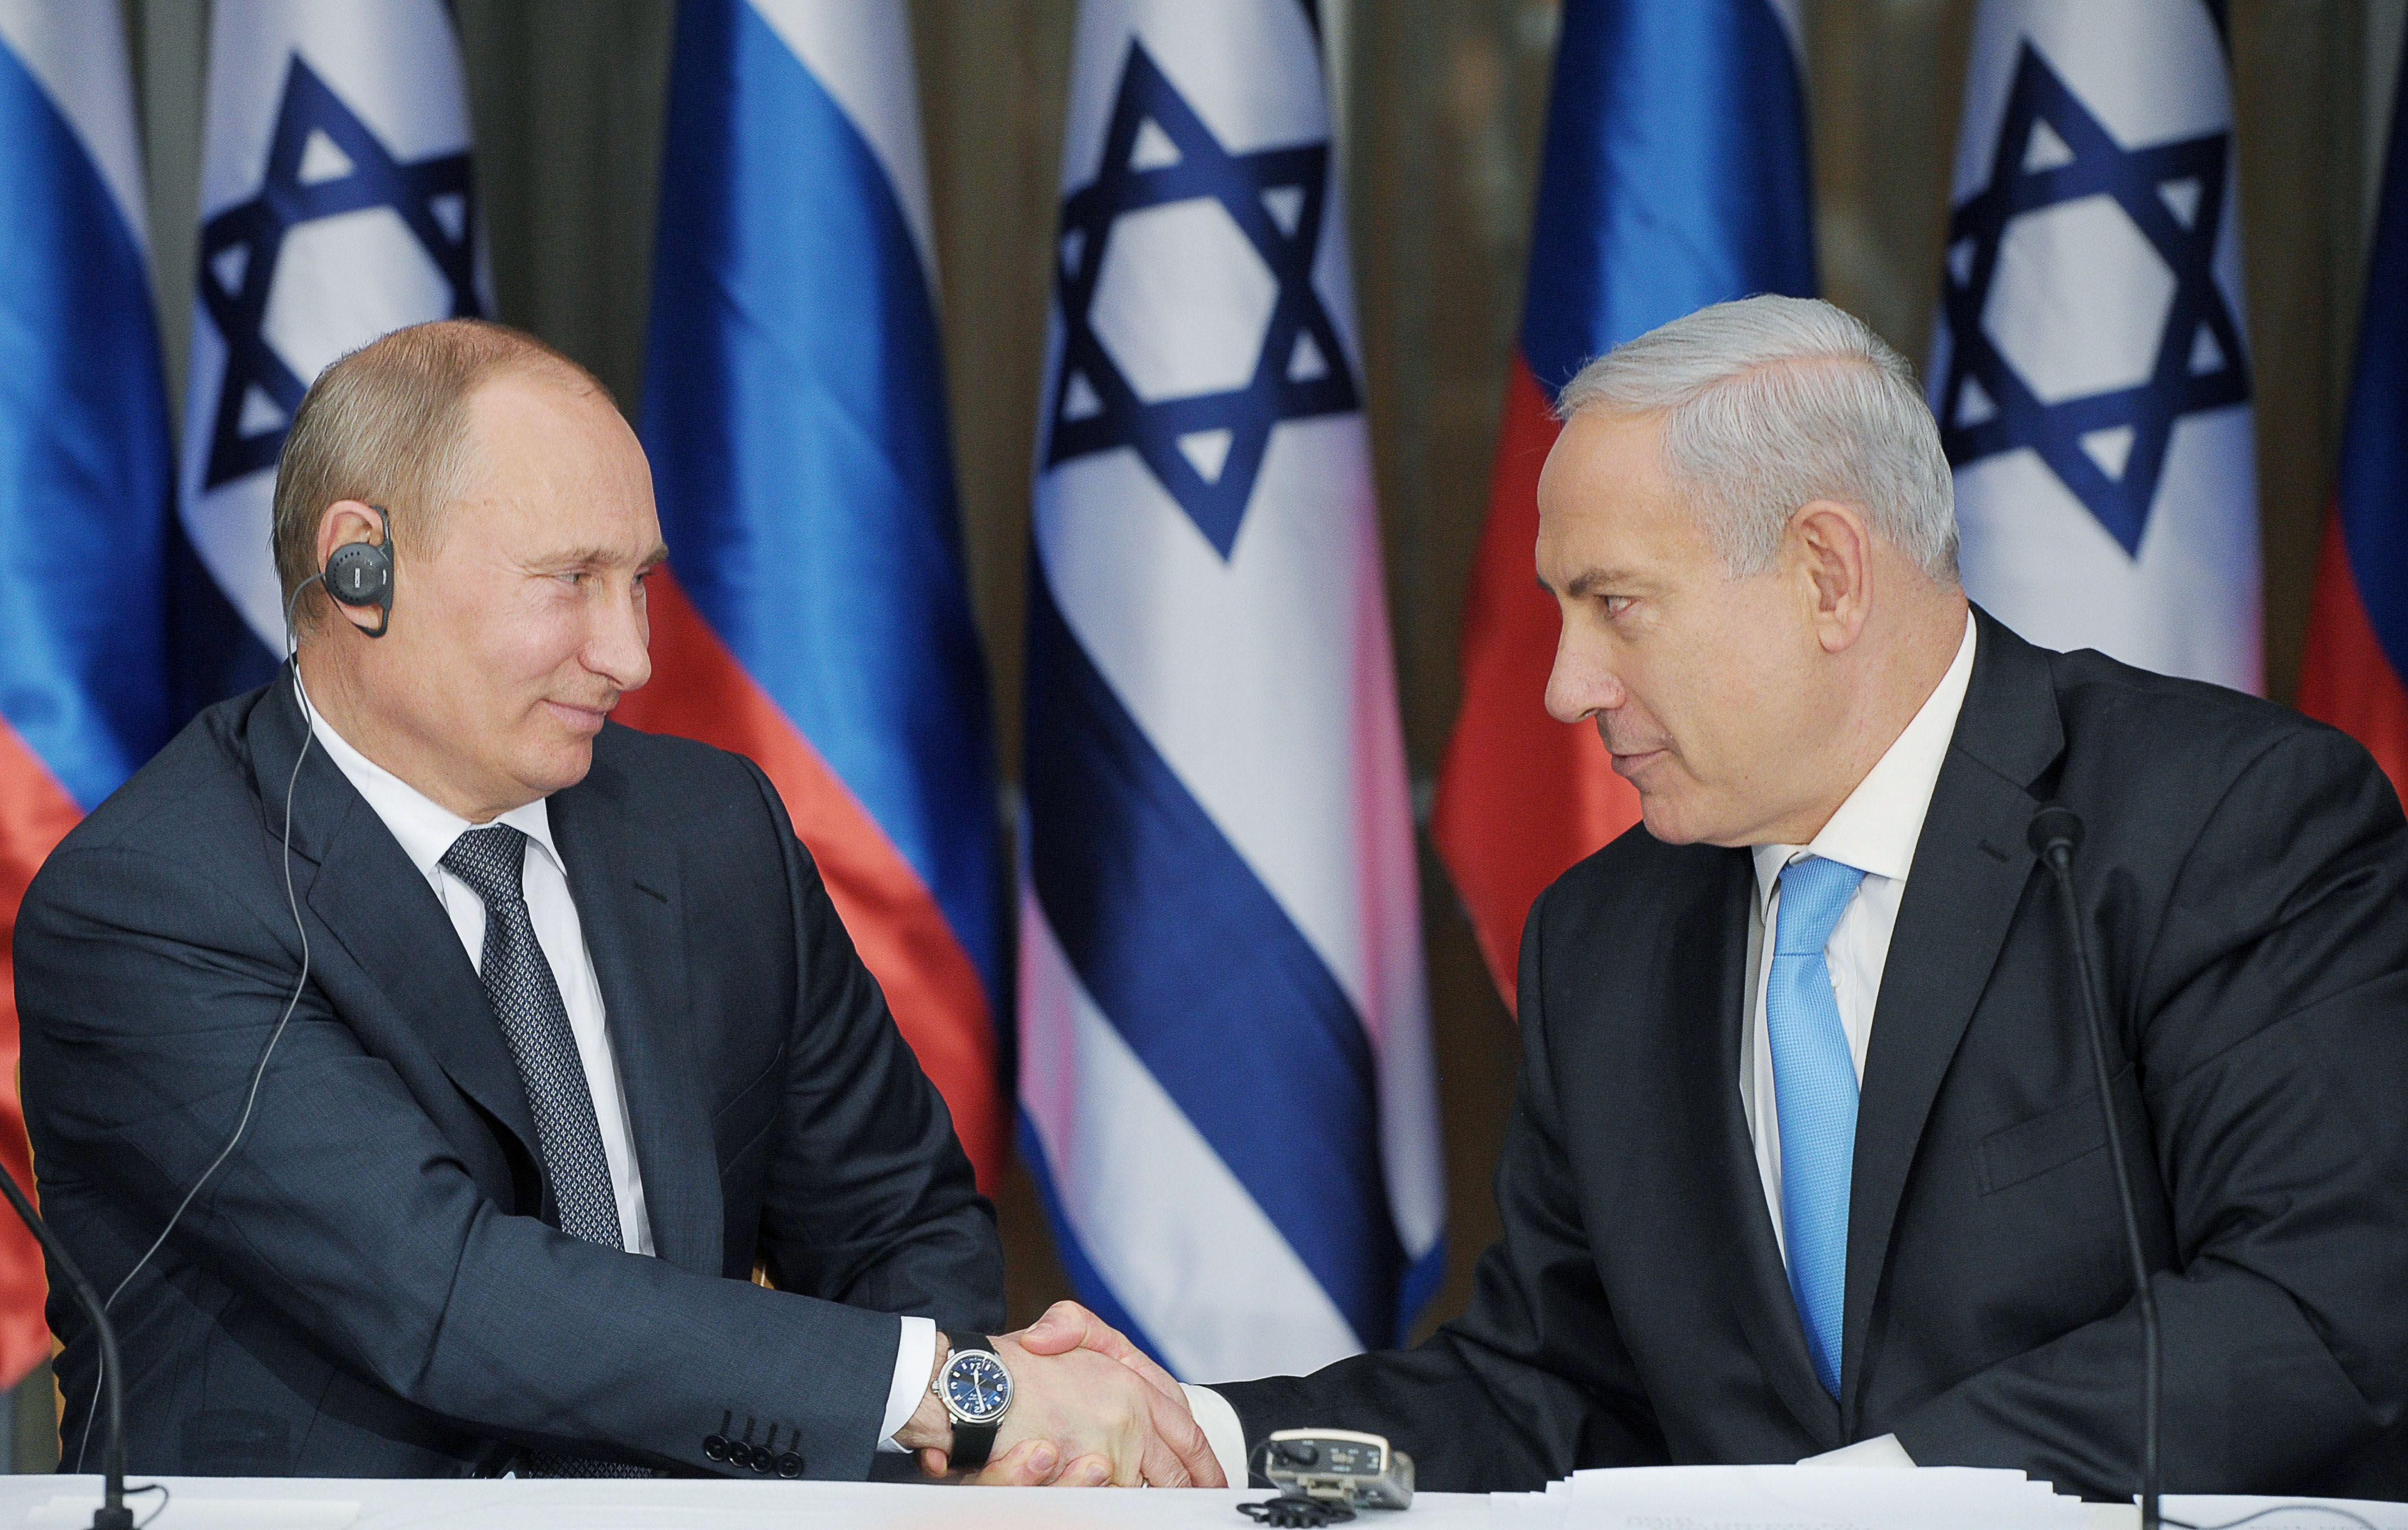 Da sinistra, Valdimir Putin e Beniamin Netanyahu